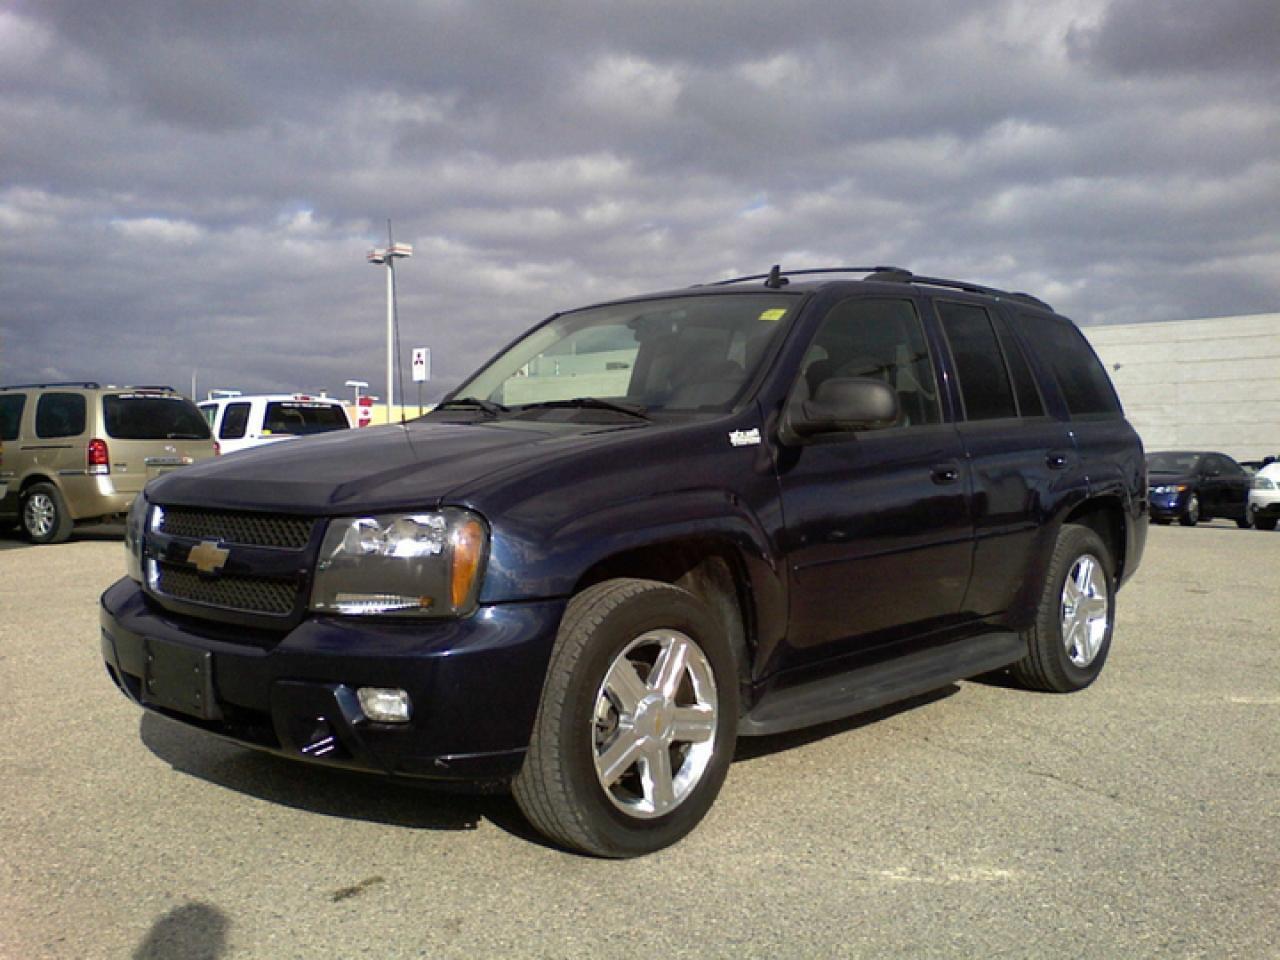 Used 2008 Chevrolet TrailBlazer Sport Utility 4D for Sale in Winnipeg, Manitoba | Carpages.ca